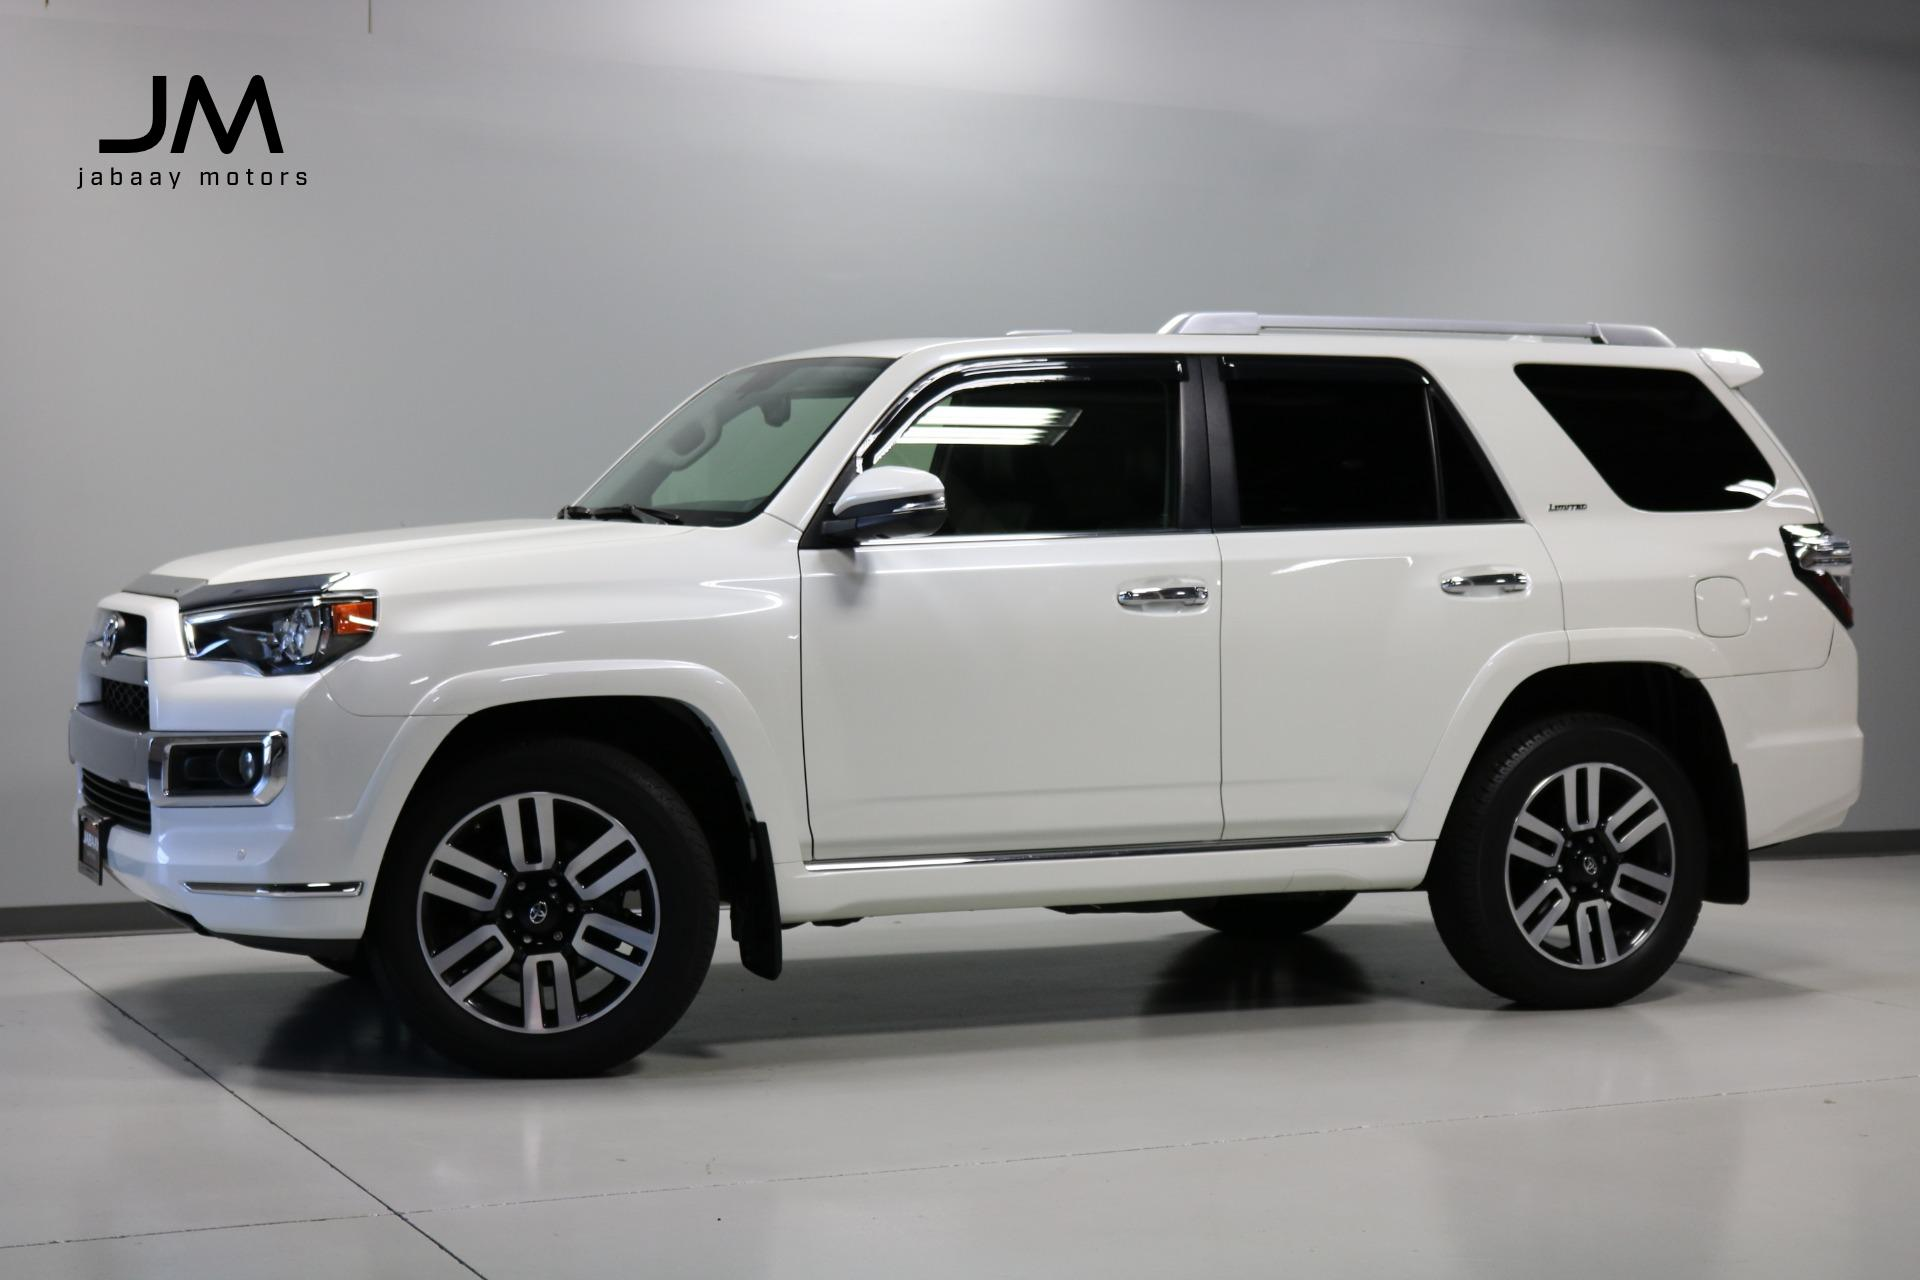 Used 2016 Toyota 4runner Limited For Sale Sold Jabaay Motors Inc Stock Jm7392